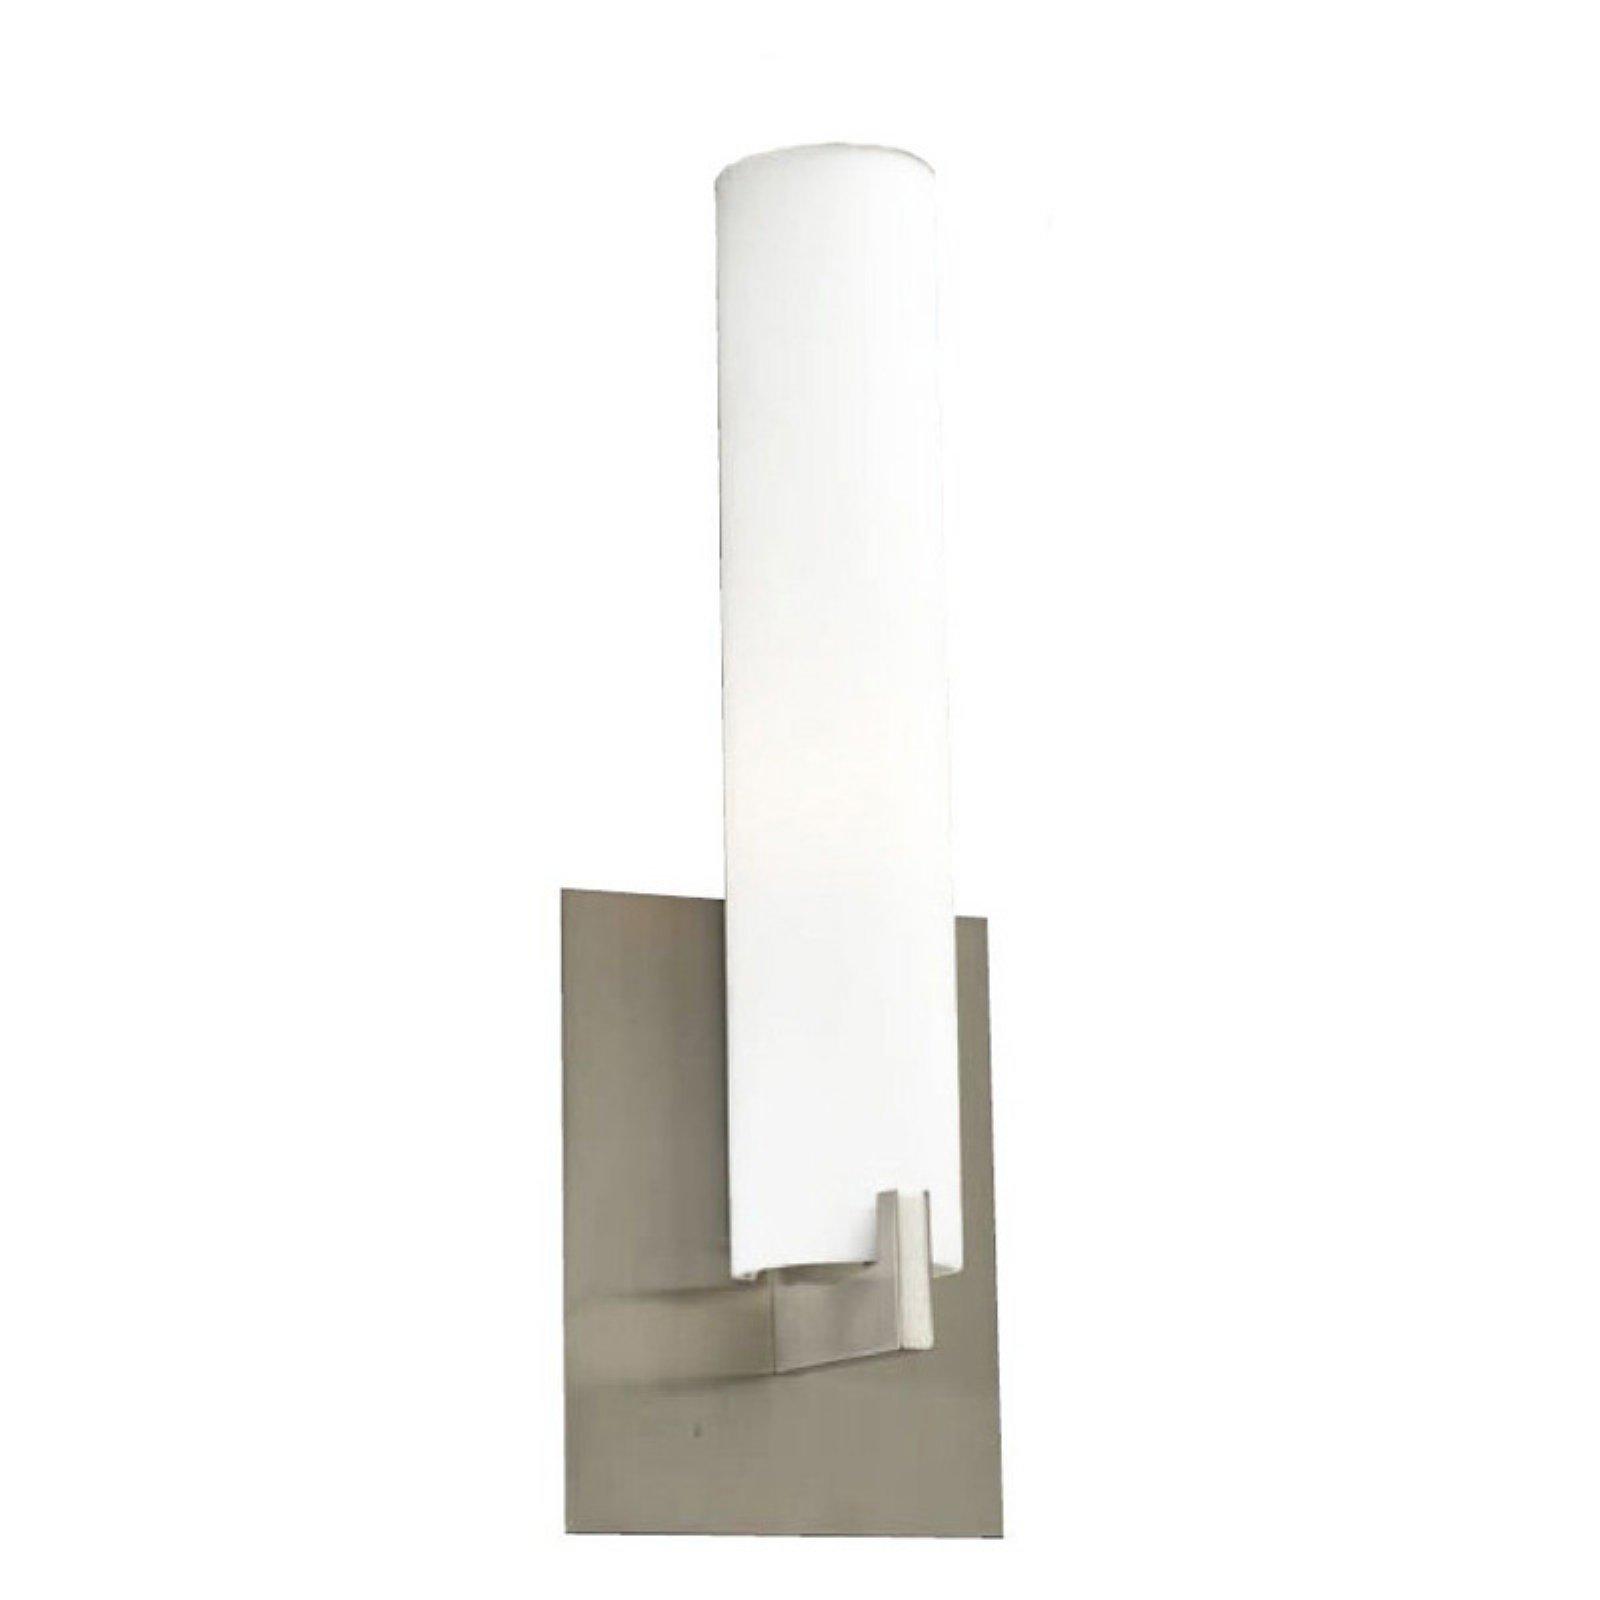 Aleta Collection PLC Lighting 651 SN 1 Light Vanity Satin Nickel Finish